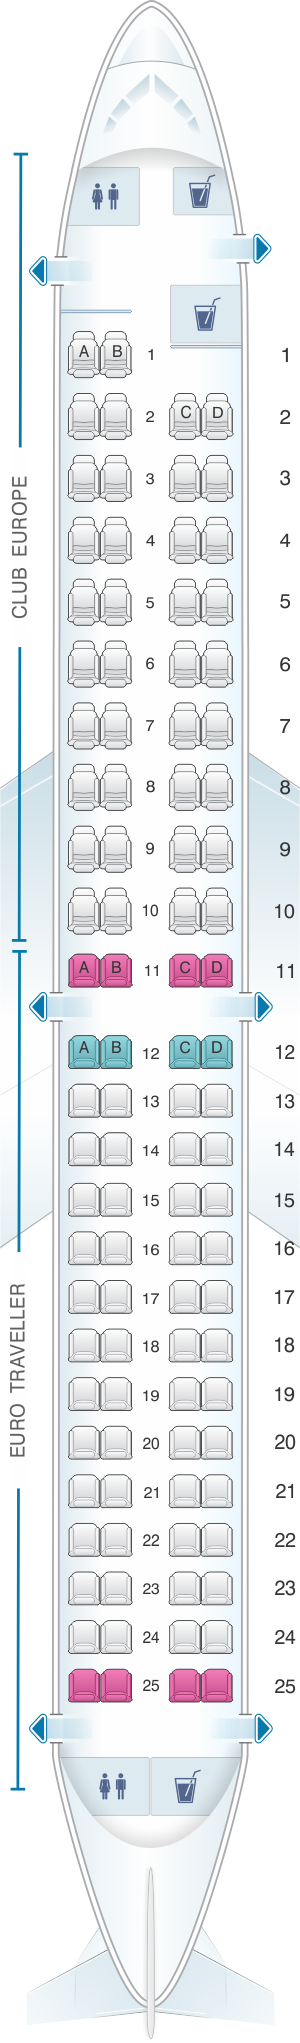 Seat map for British Airways Embraer 190 European